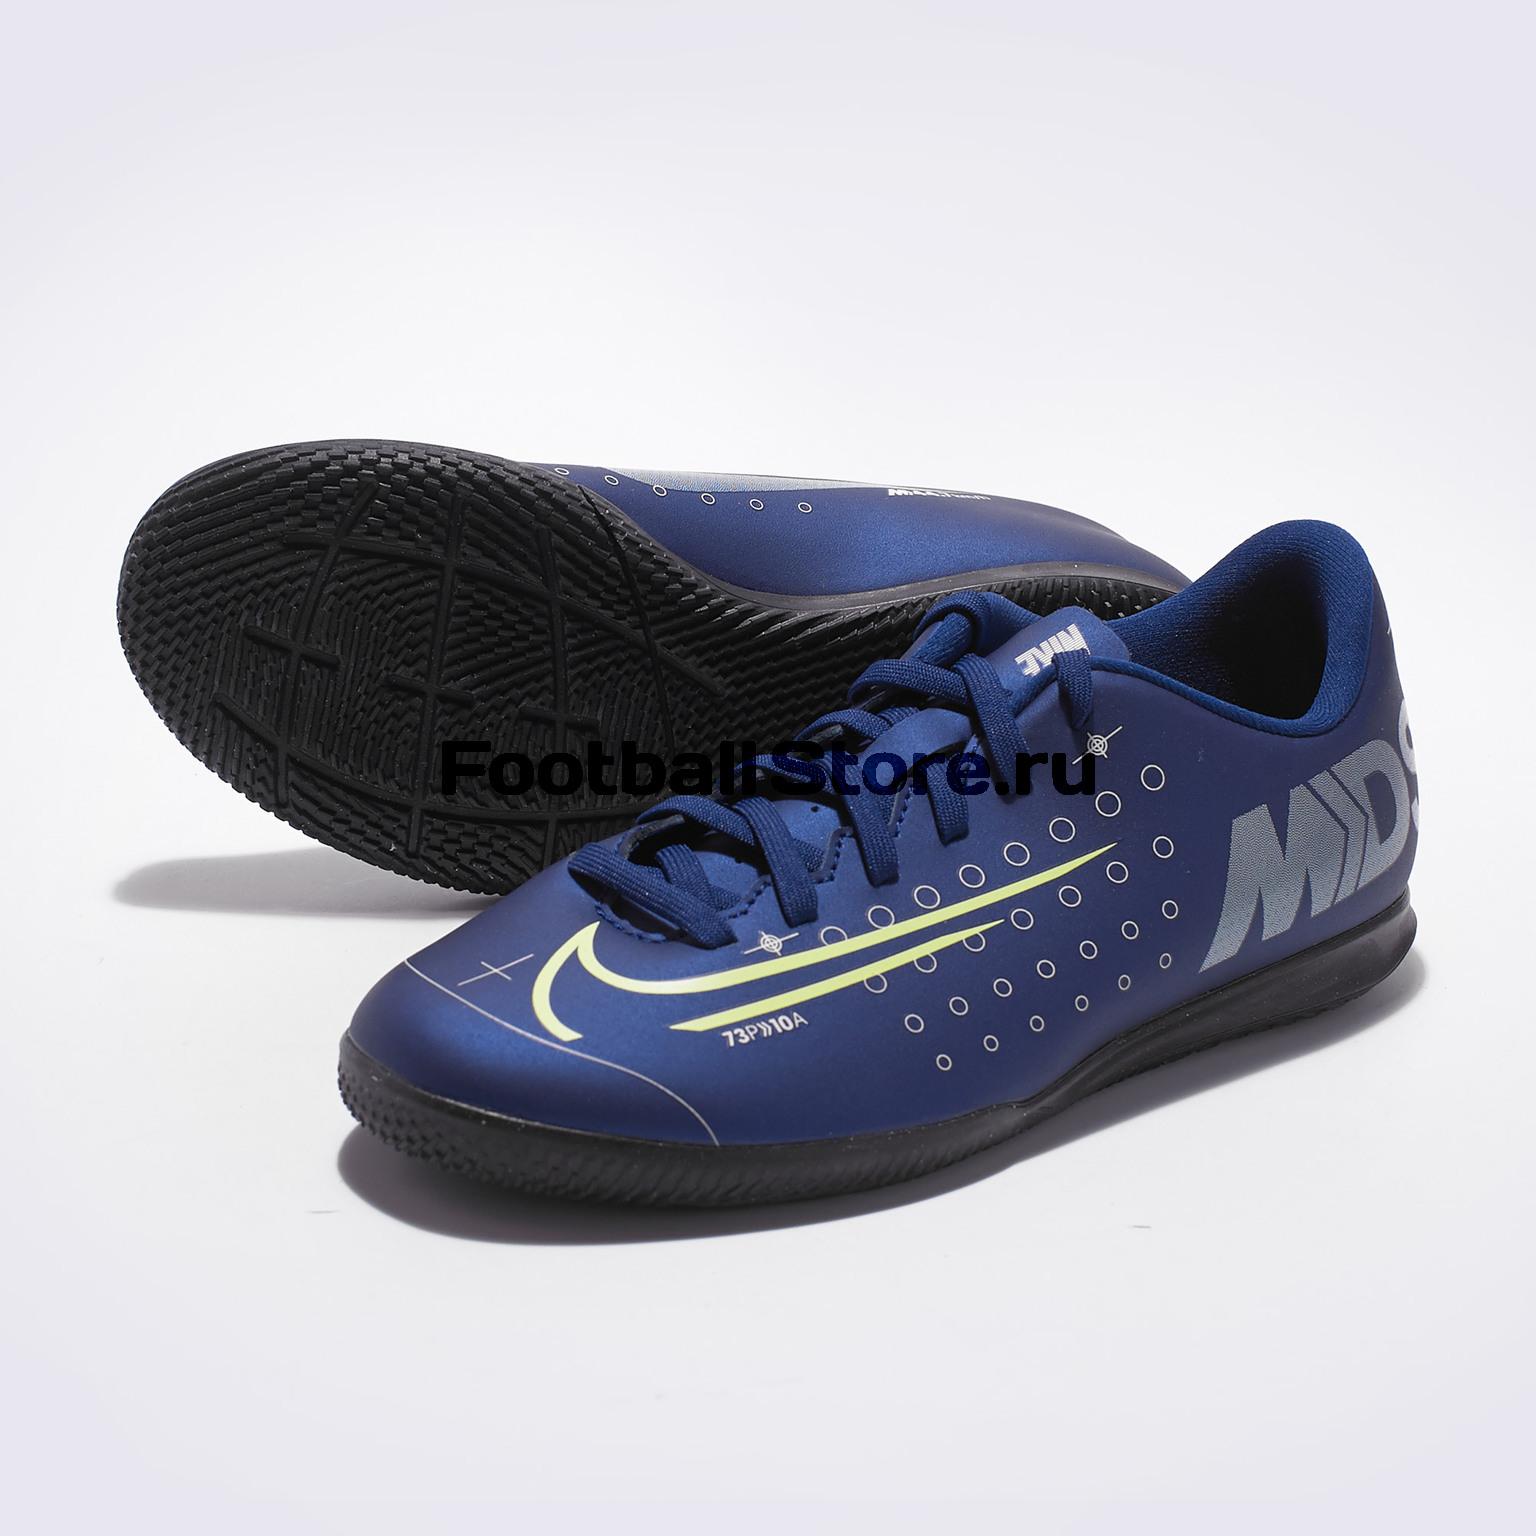 Футзалки детские Nike Vapor 13 Club MDS IC CJ1174-401 nike vapor gymsack